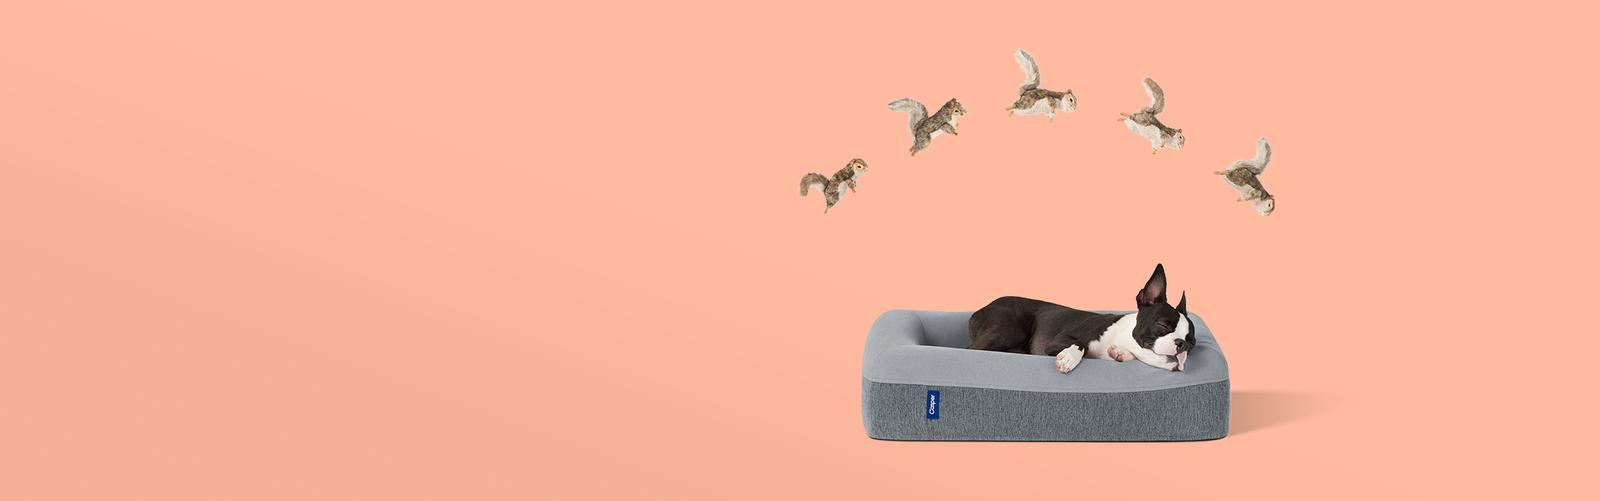 wicker dog bed